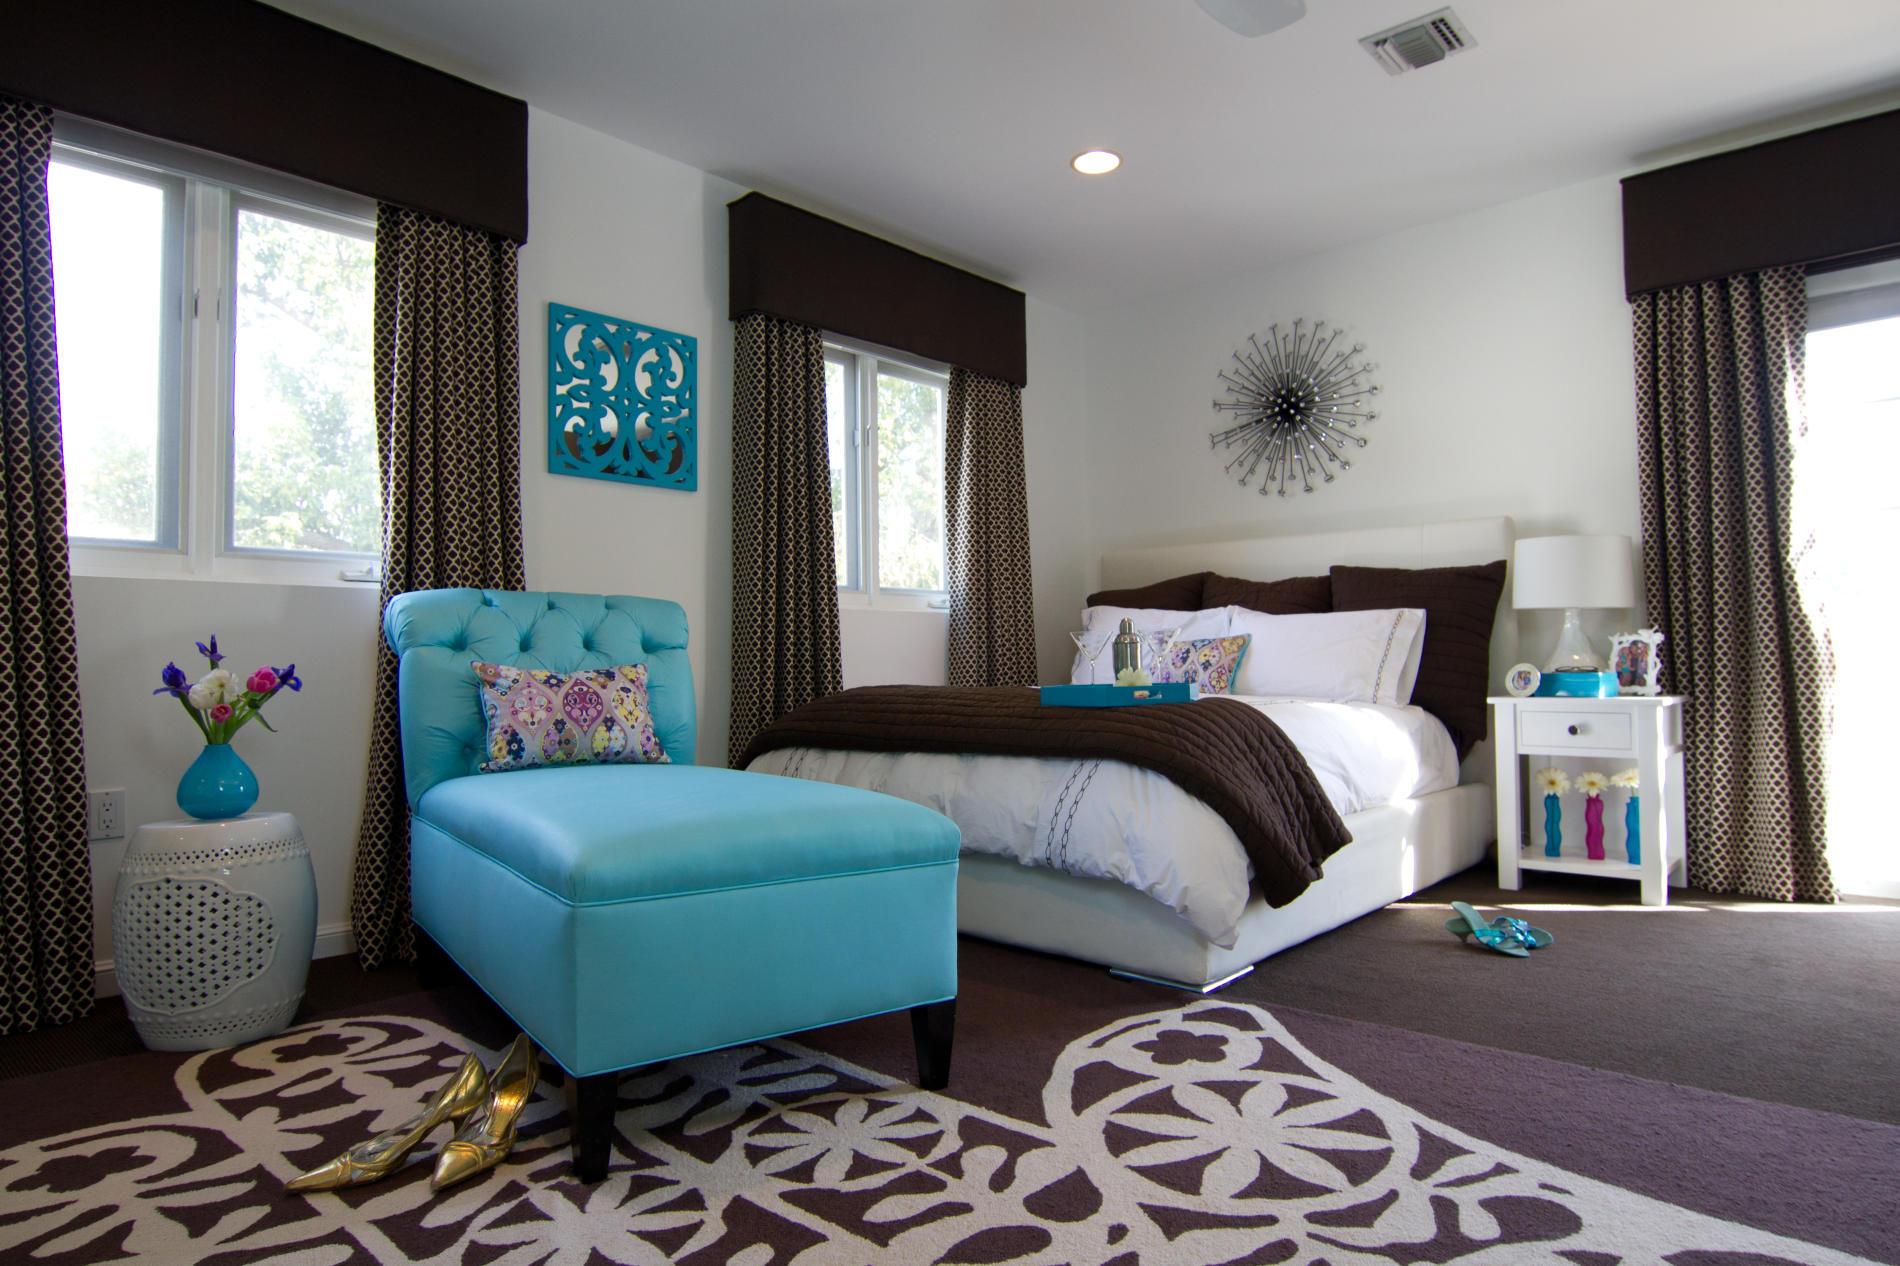 Make Your Bedroom a Romantic Haven Part 4  My Decorative